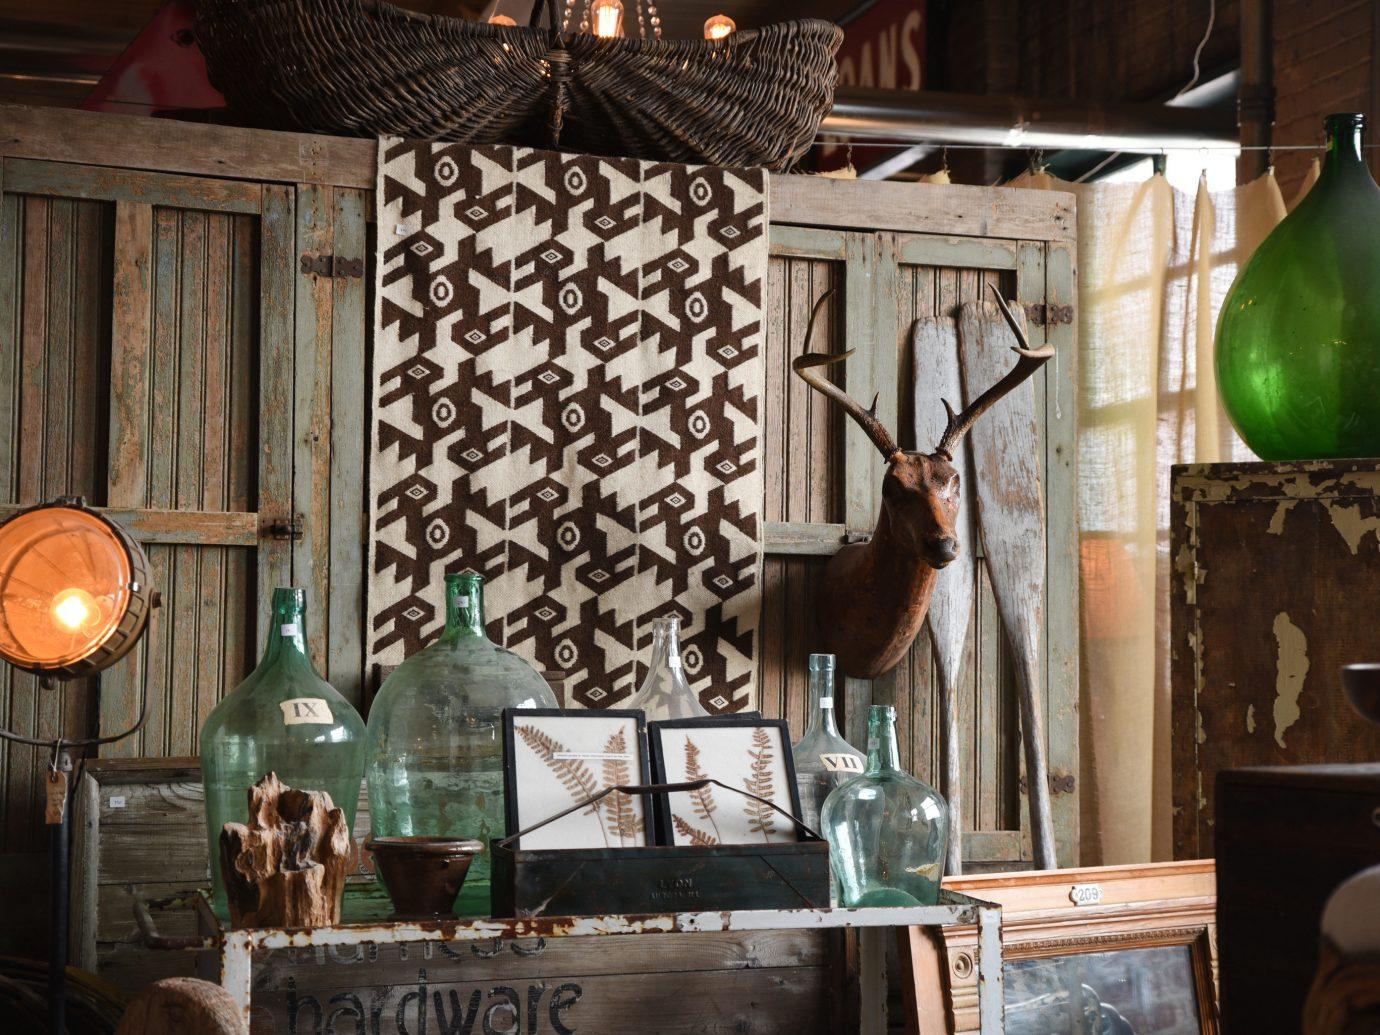 Trip Ideas indoor lighting interior design restaurant home wood living room furniture cluttered